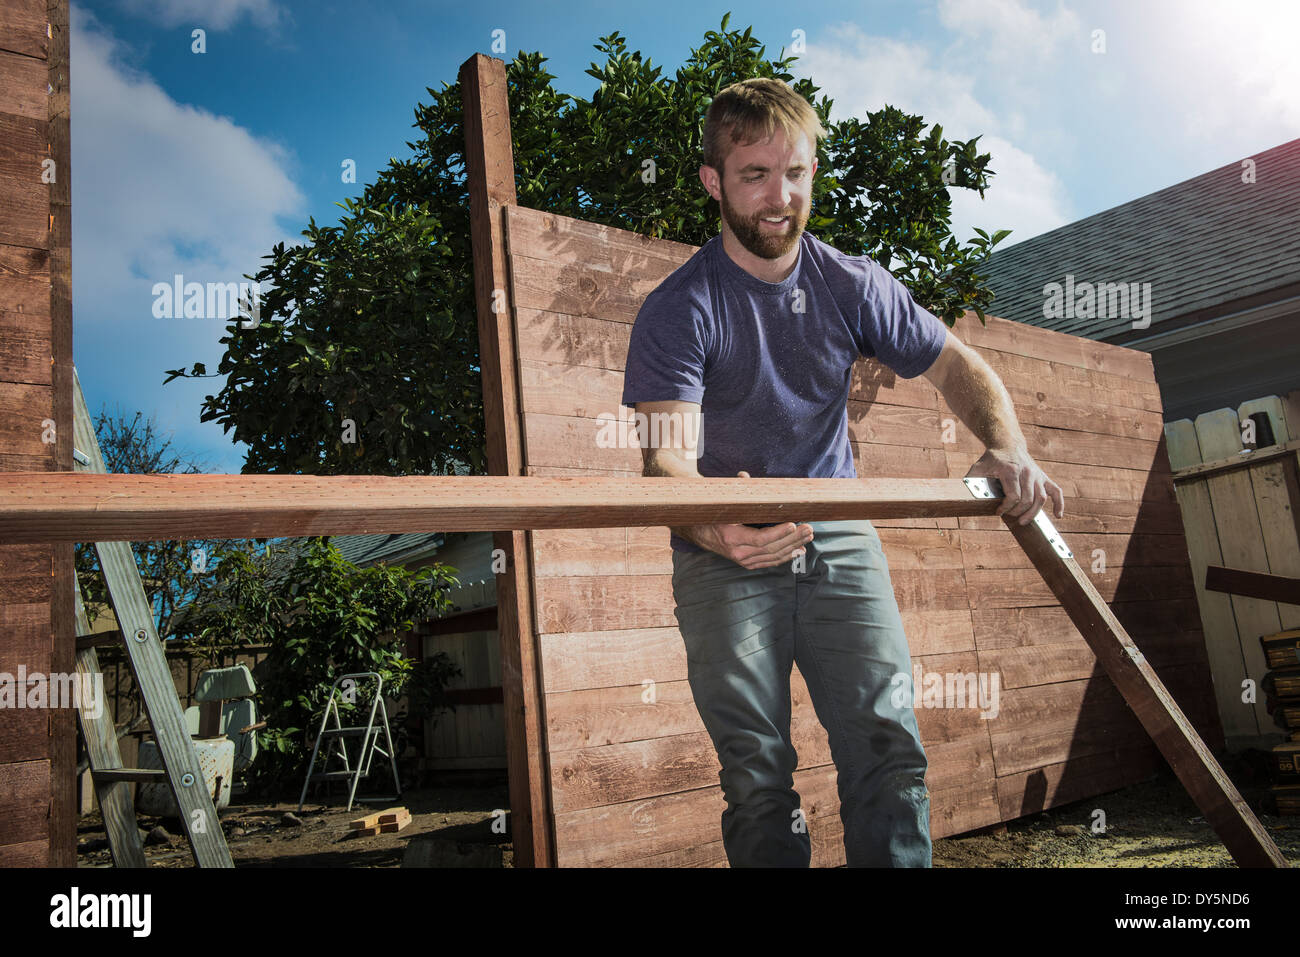 Tischler in Hinterhof heben Holz Rahmen Stockbild